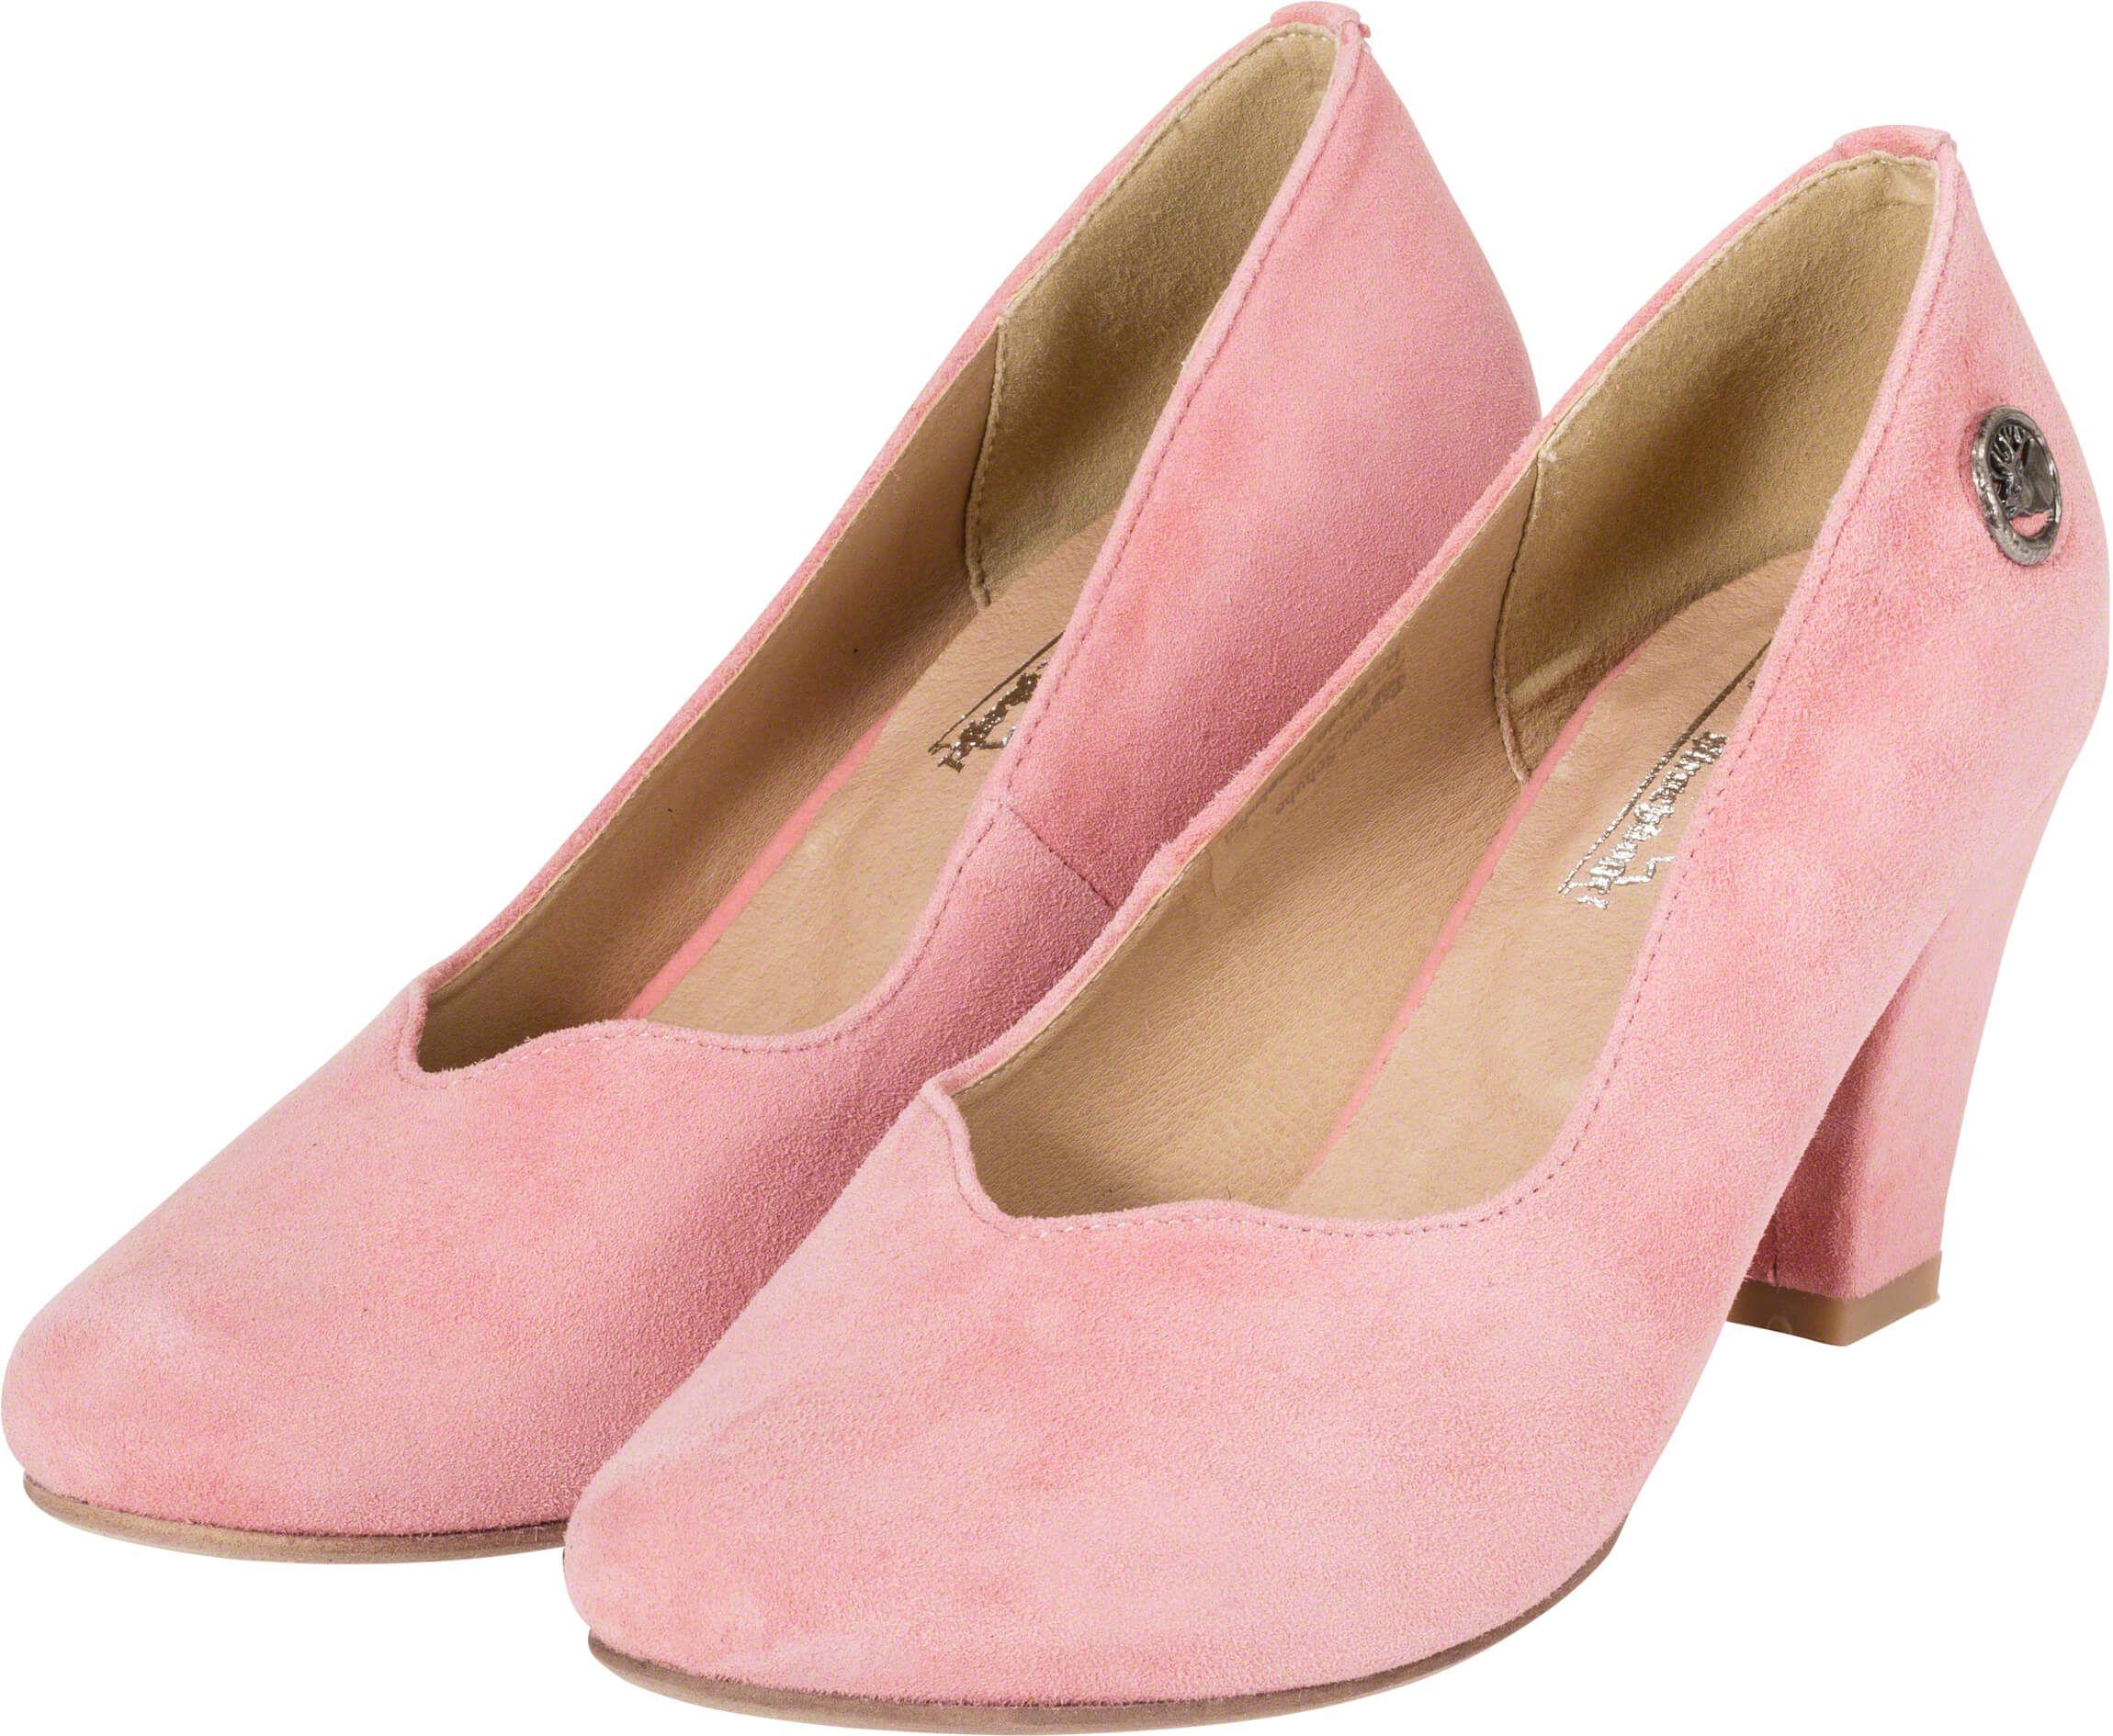 cb921a9e704aa1 Trachtenschuhe für Damen in Rosa Dirndl-Schuhe mit bequemem Absatz  Trachtenpumps